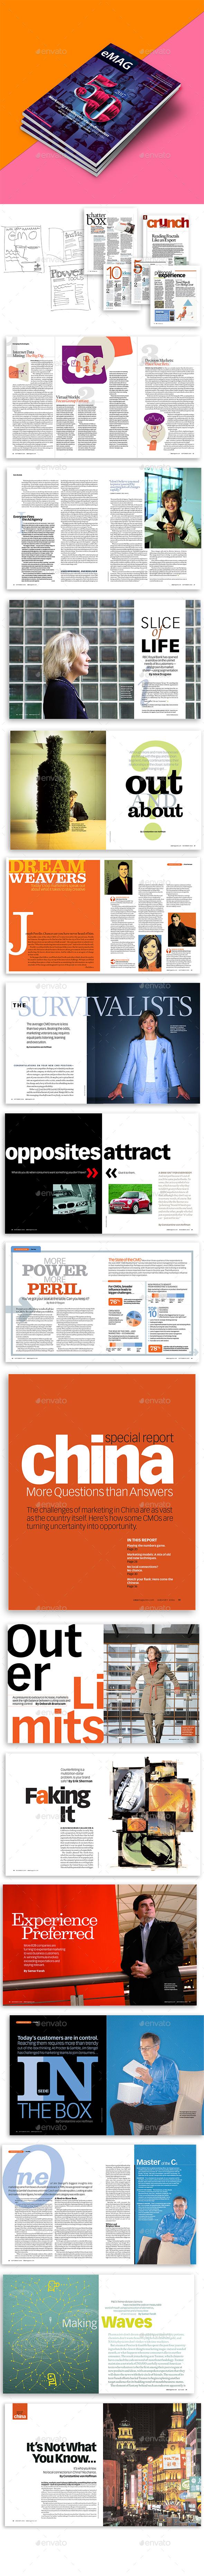 Newburn Marketing / Technology Magazine  InDesign Template - Magazines Print Templates